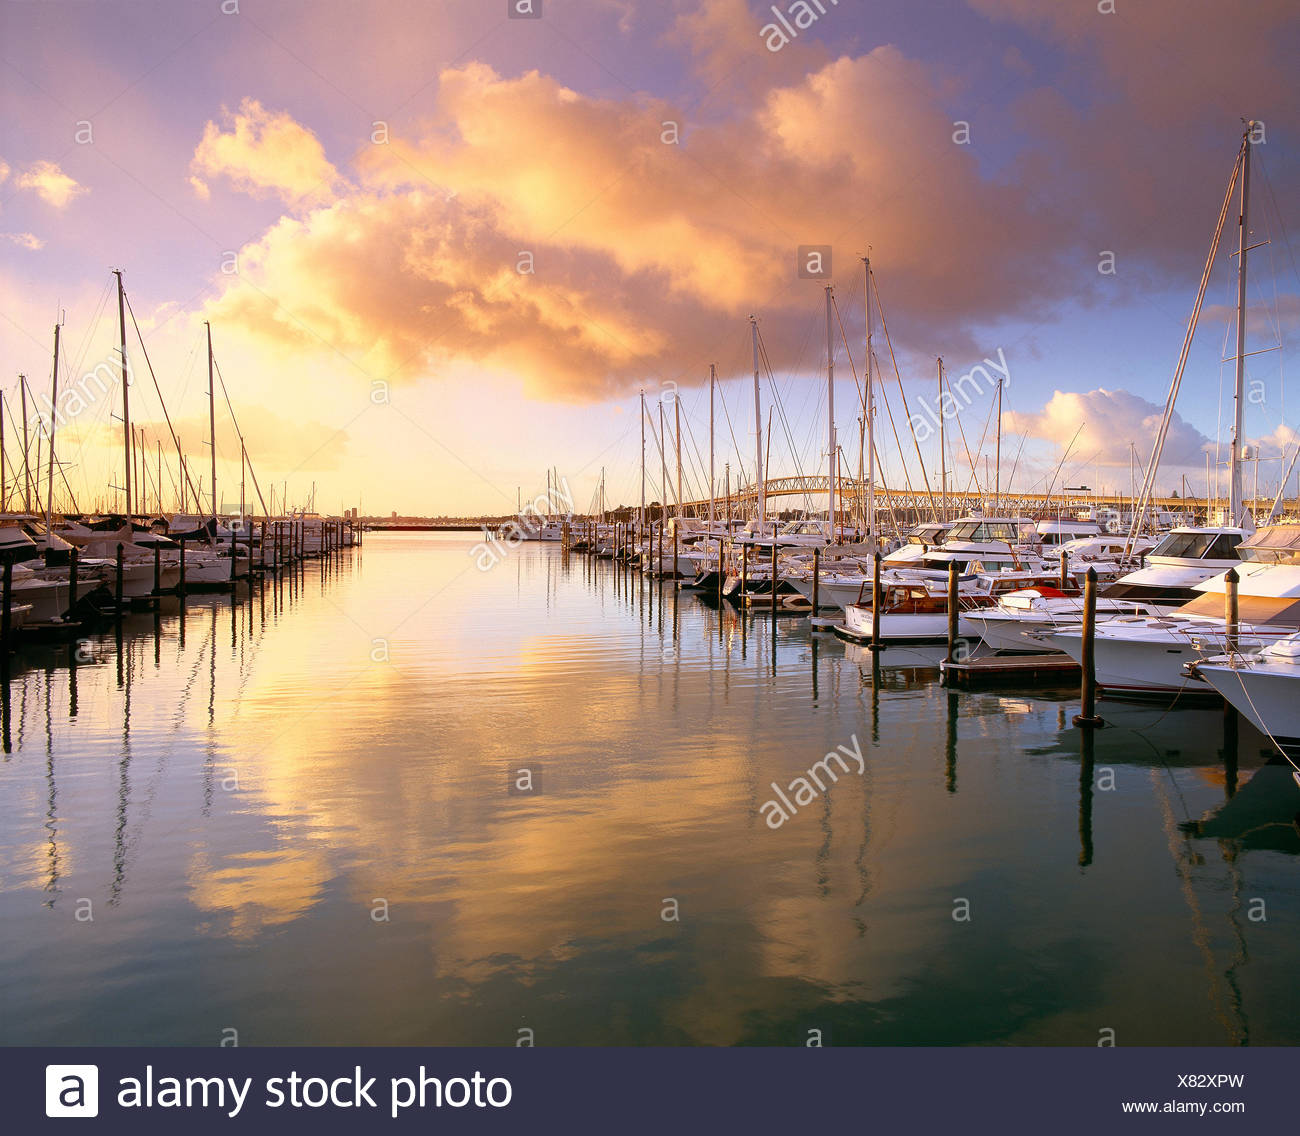 Neuseeland. Auckland. Yachten in der Marina bei Sonnenaufgang. Stockbild